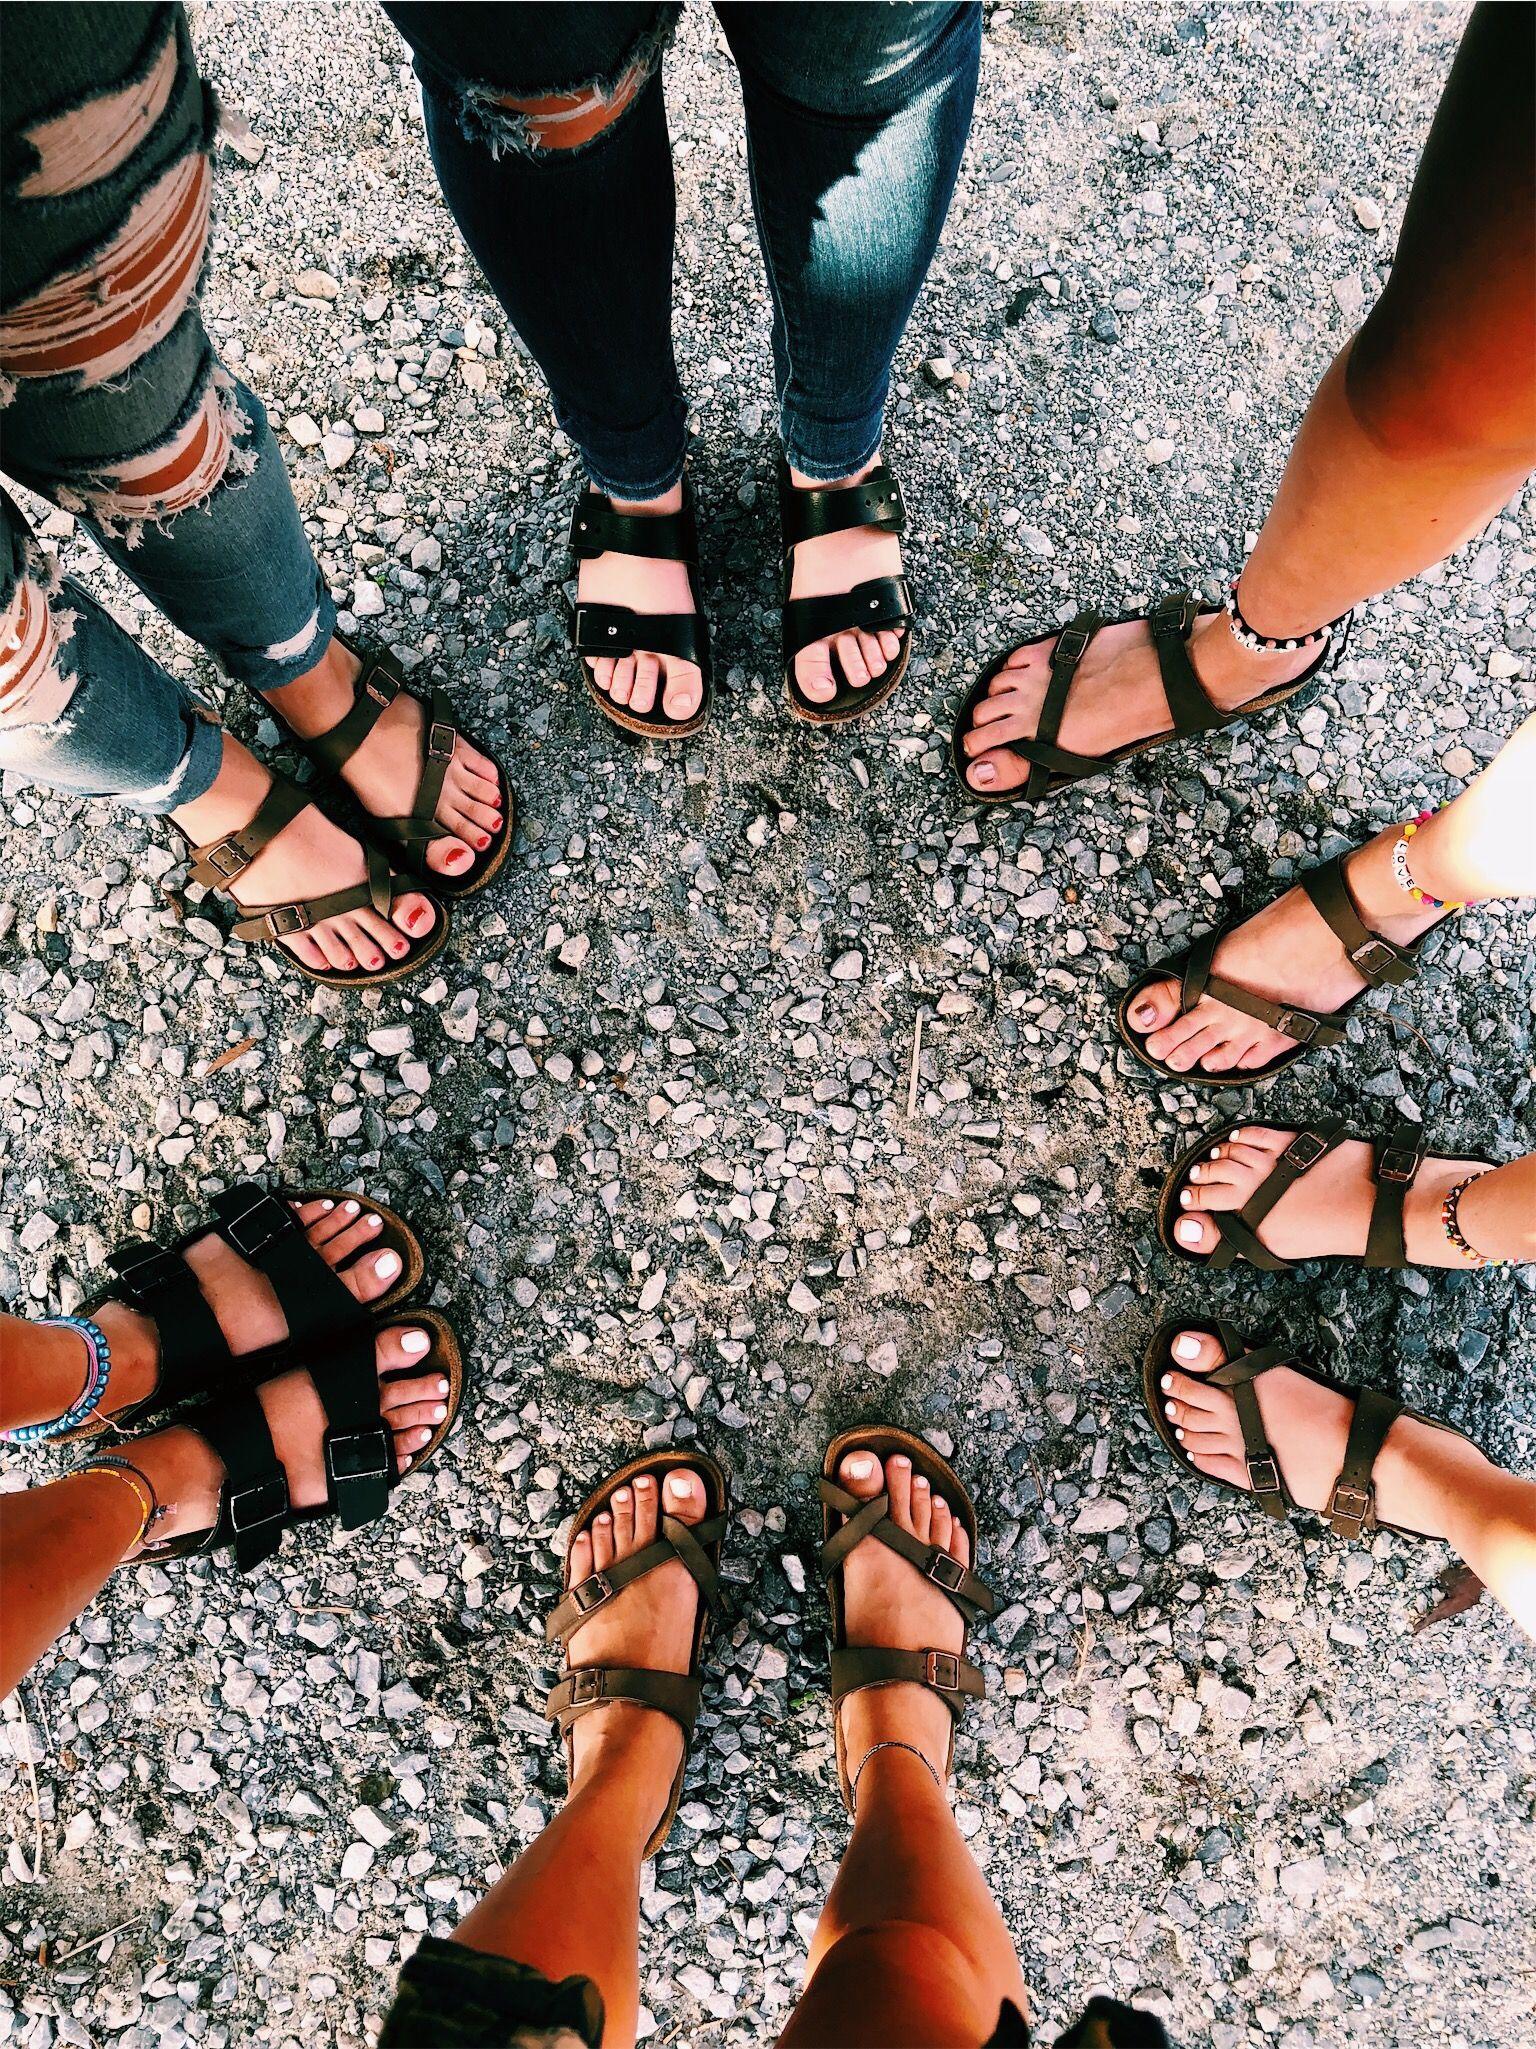 birkenstock #birks #shoes #sandals